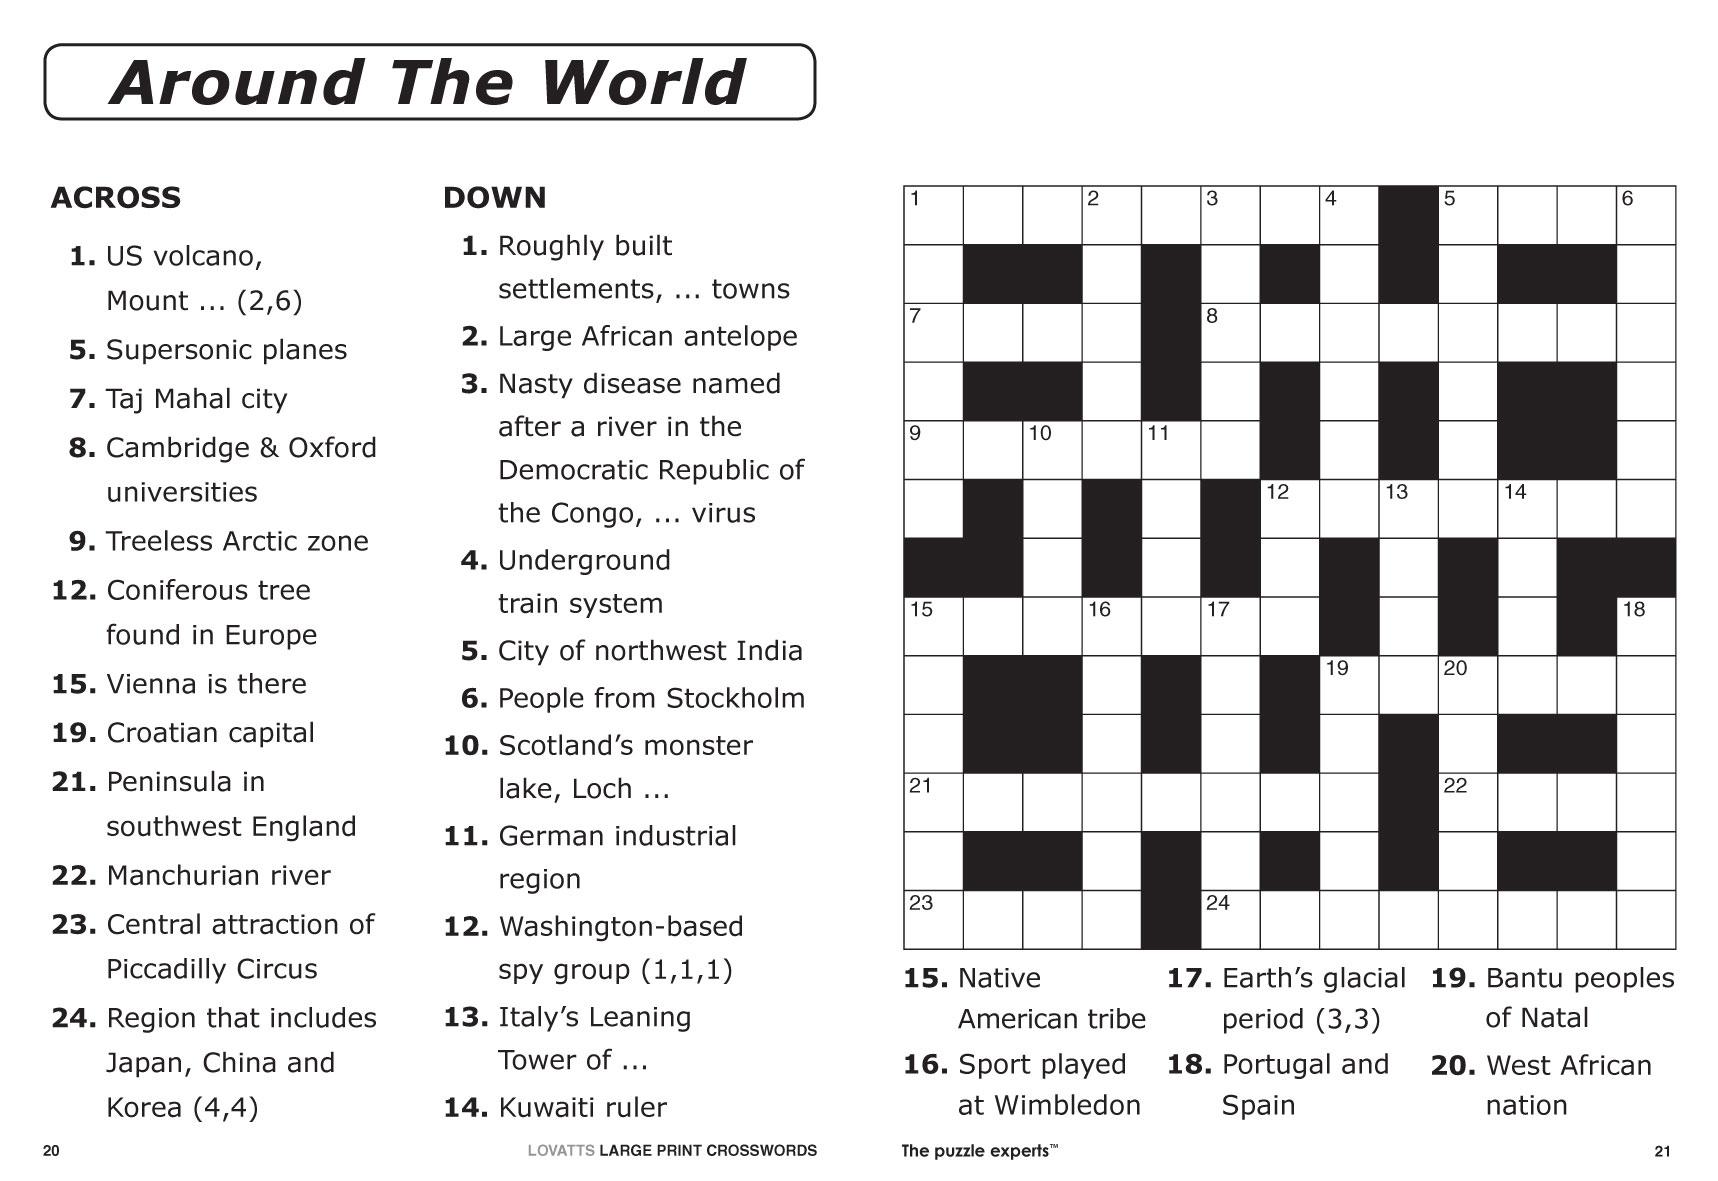 Australian Crossword Puzzles To Print Large Print Crosswords 2 - Printable Crossword Puzzles Australia